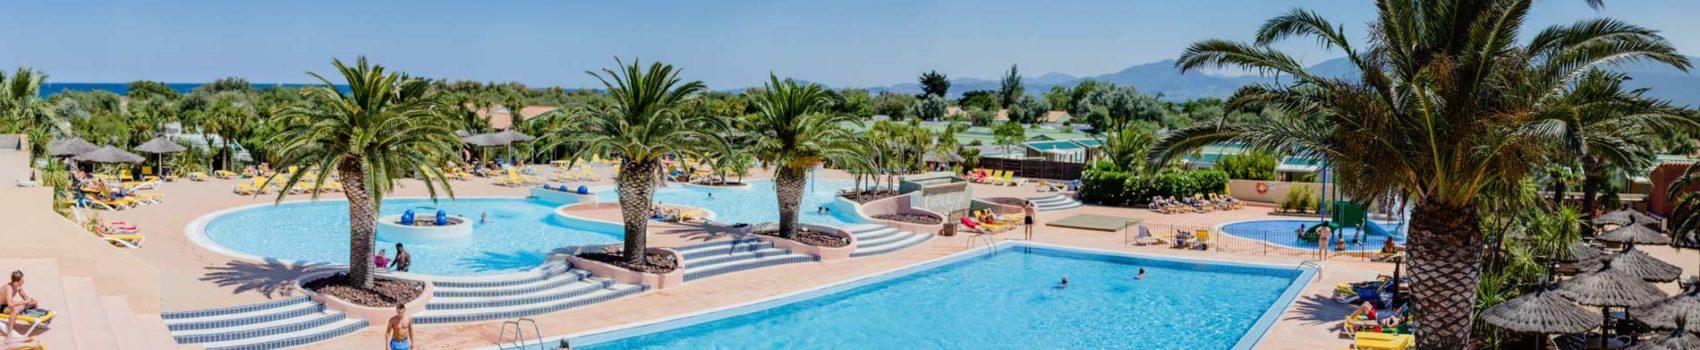 Camping saint cyprien avec parc aquatique piscine for Camping calvados bord de mer avec piscine